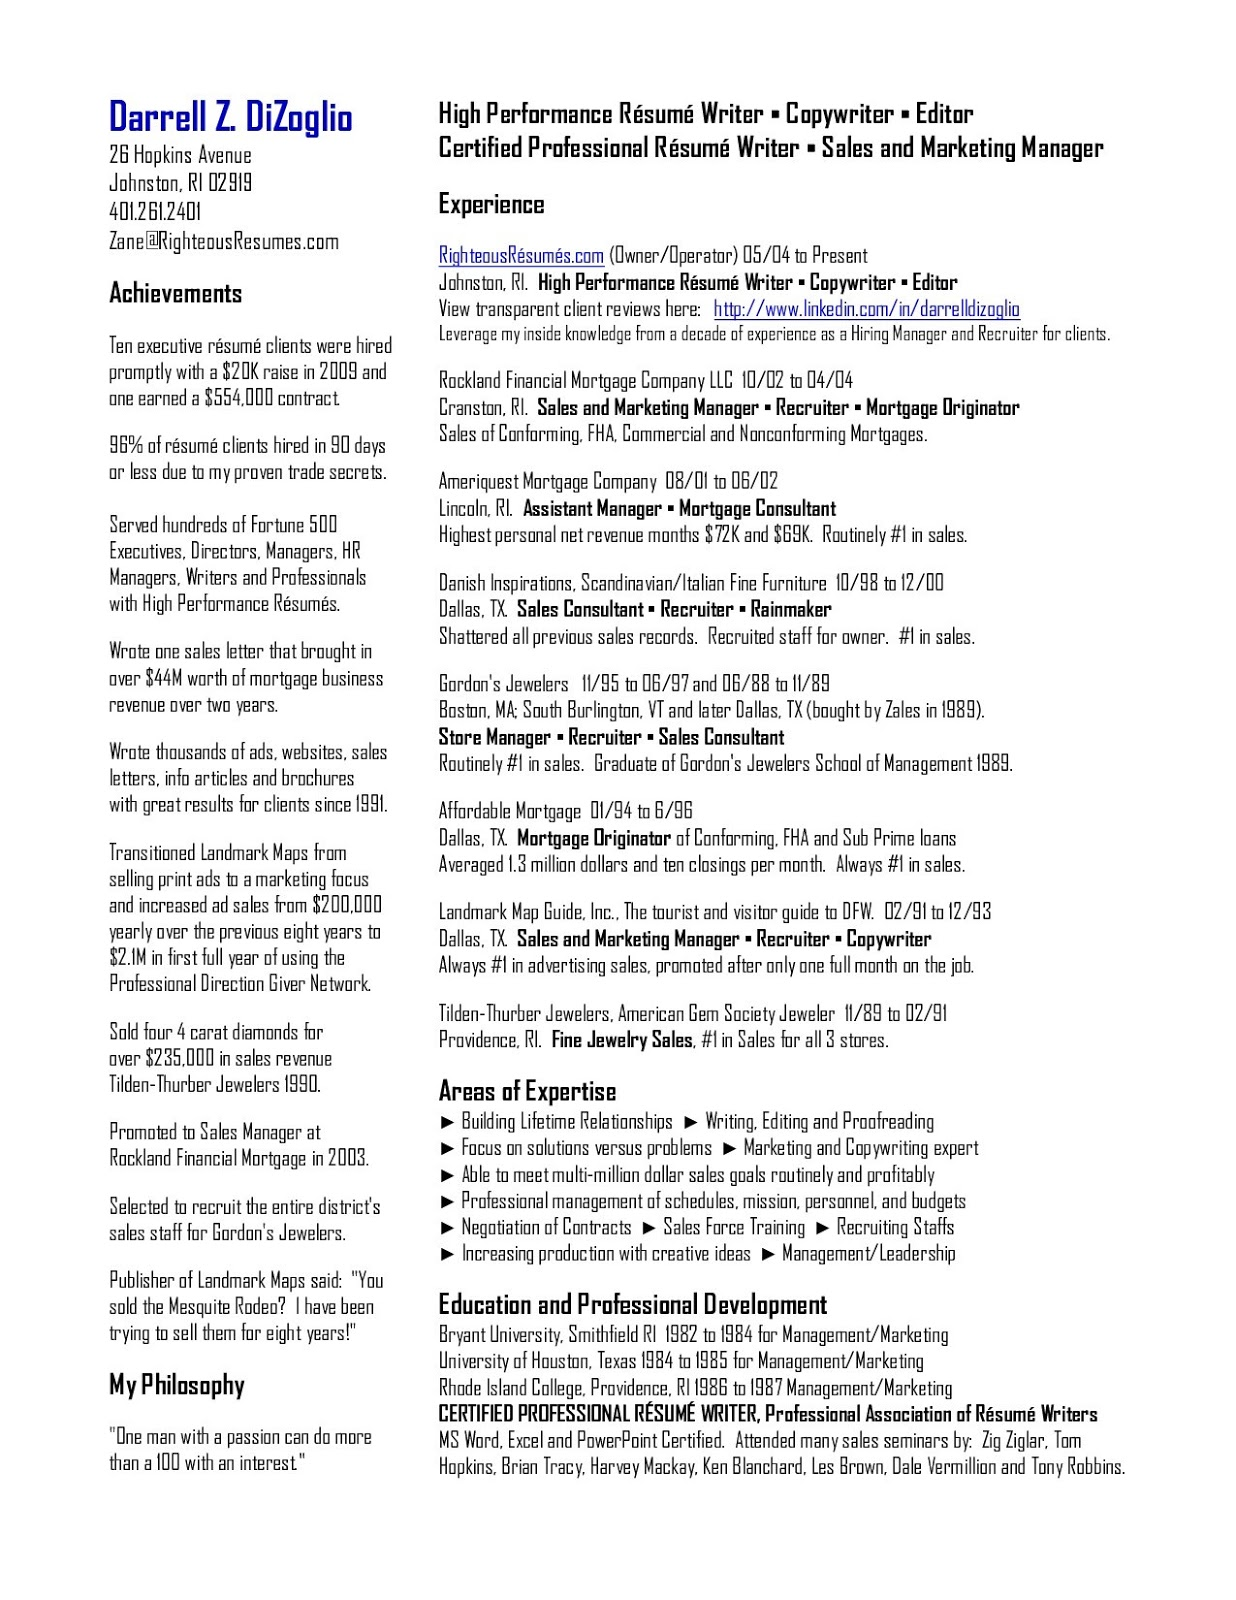 best executive resume writers 2019 top executive resume writers 2019 best executive cv writers uk best executive cv writers 2020 top 10 executive resume writers